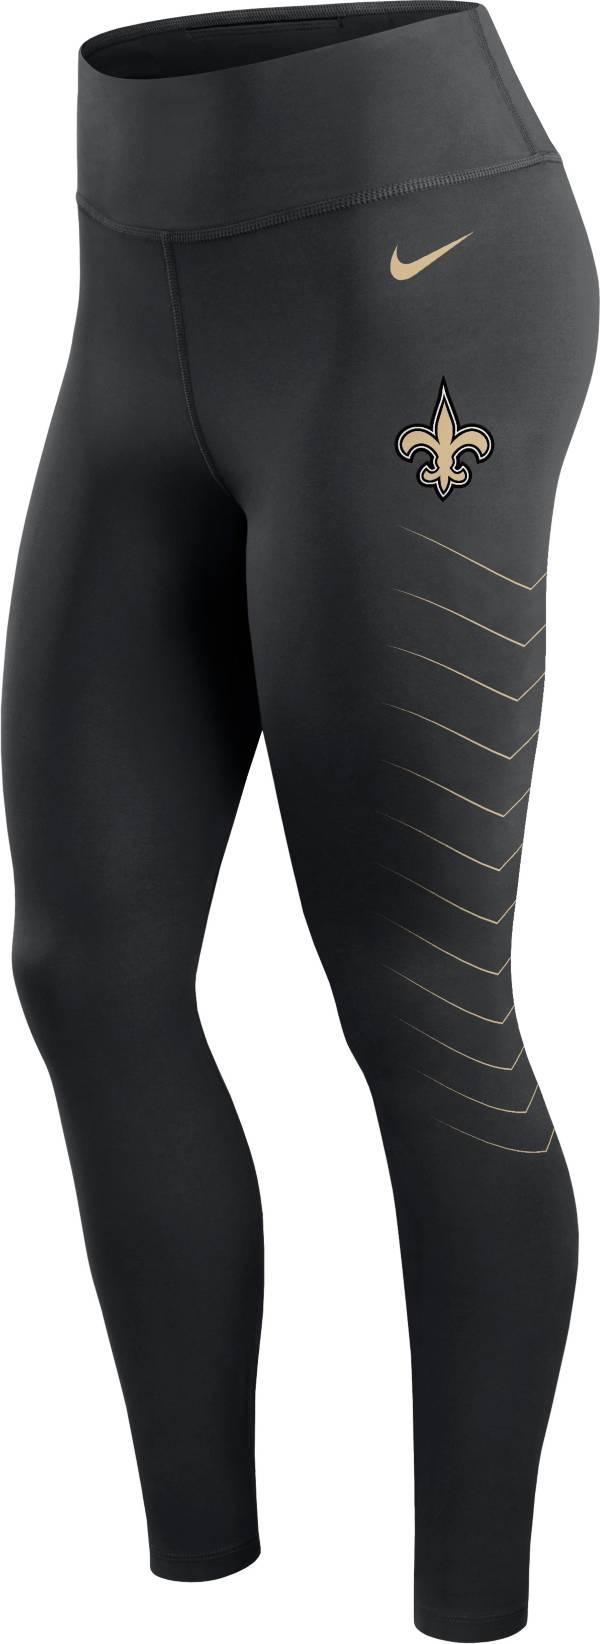 Nike Women's New Orleans Saints Dri-FIT Black Performance Leggings product image